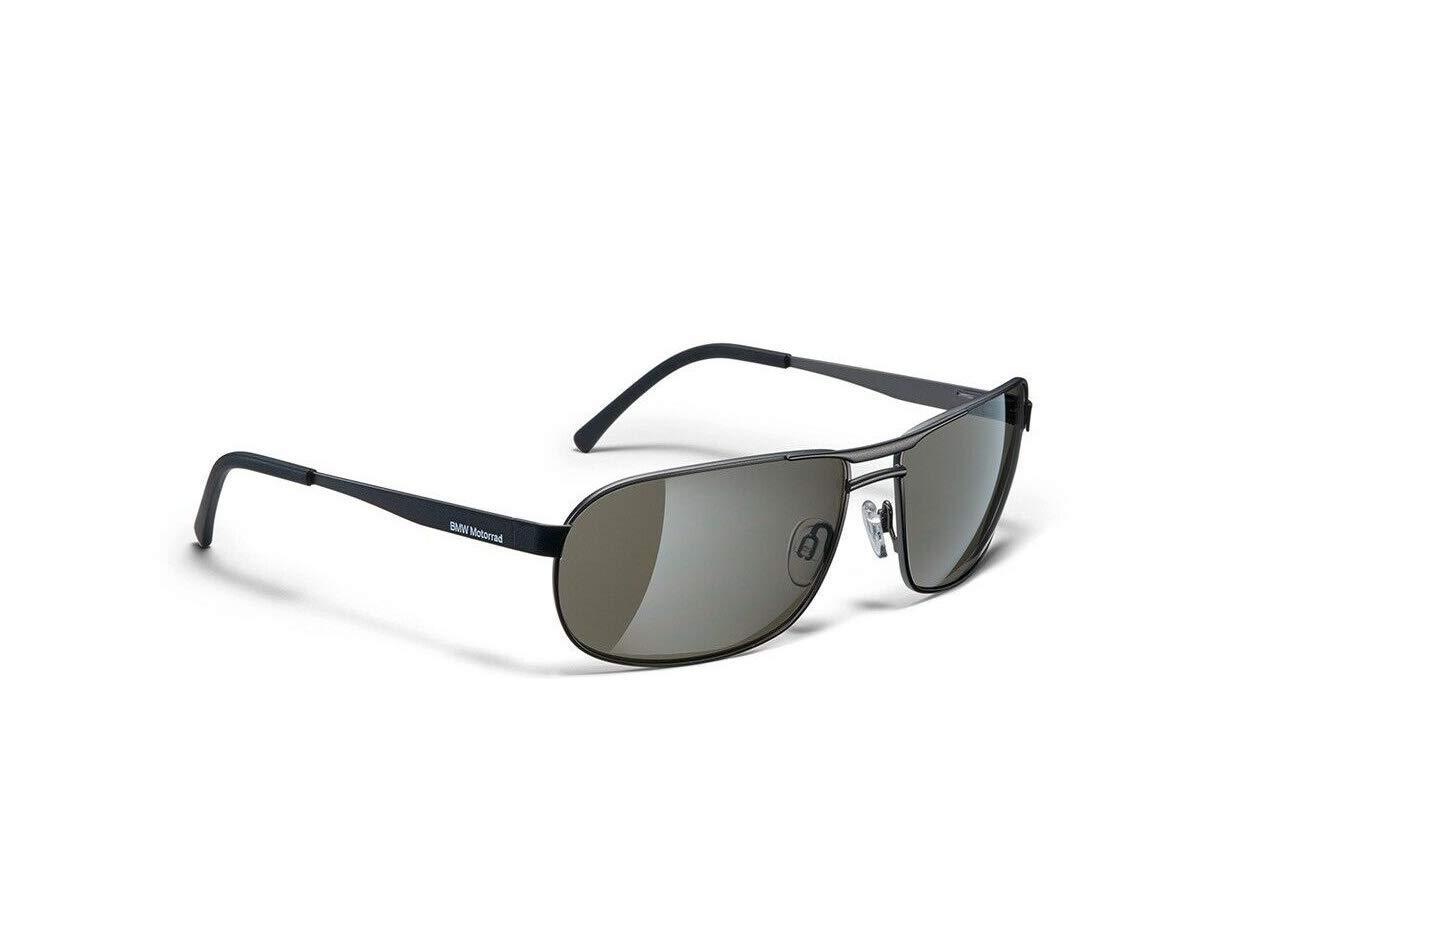 BMW Genuine Motorcycle Motorrad Ride Sunglasses Gun One Size